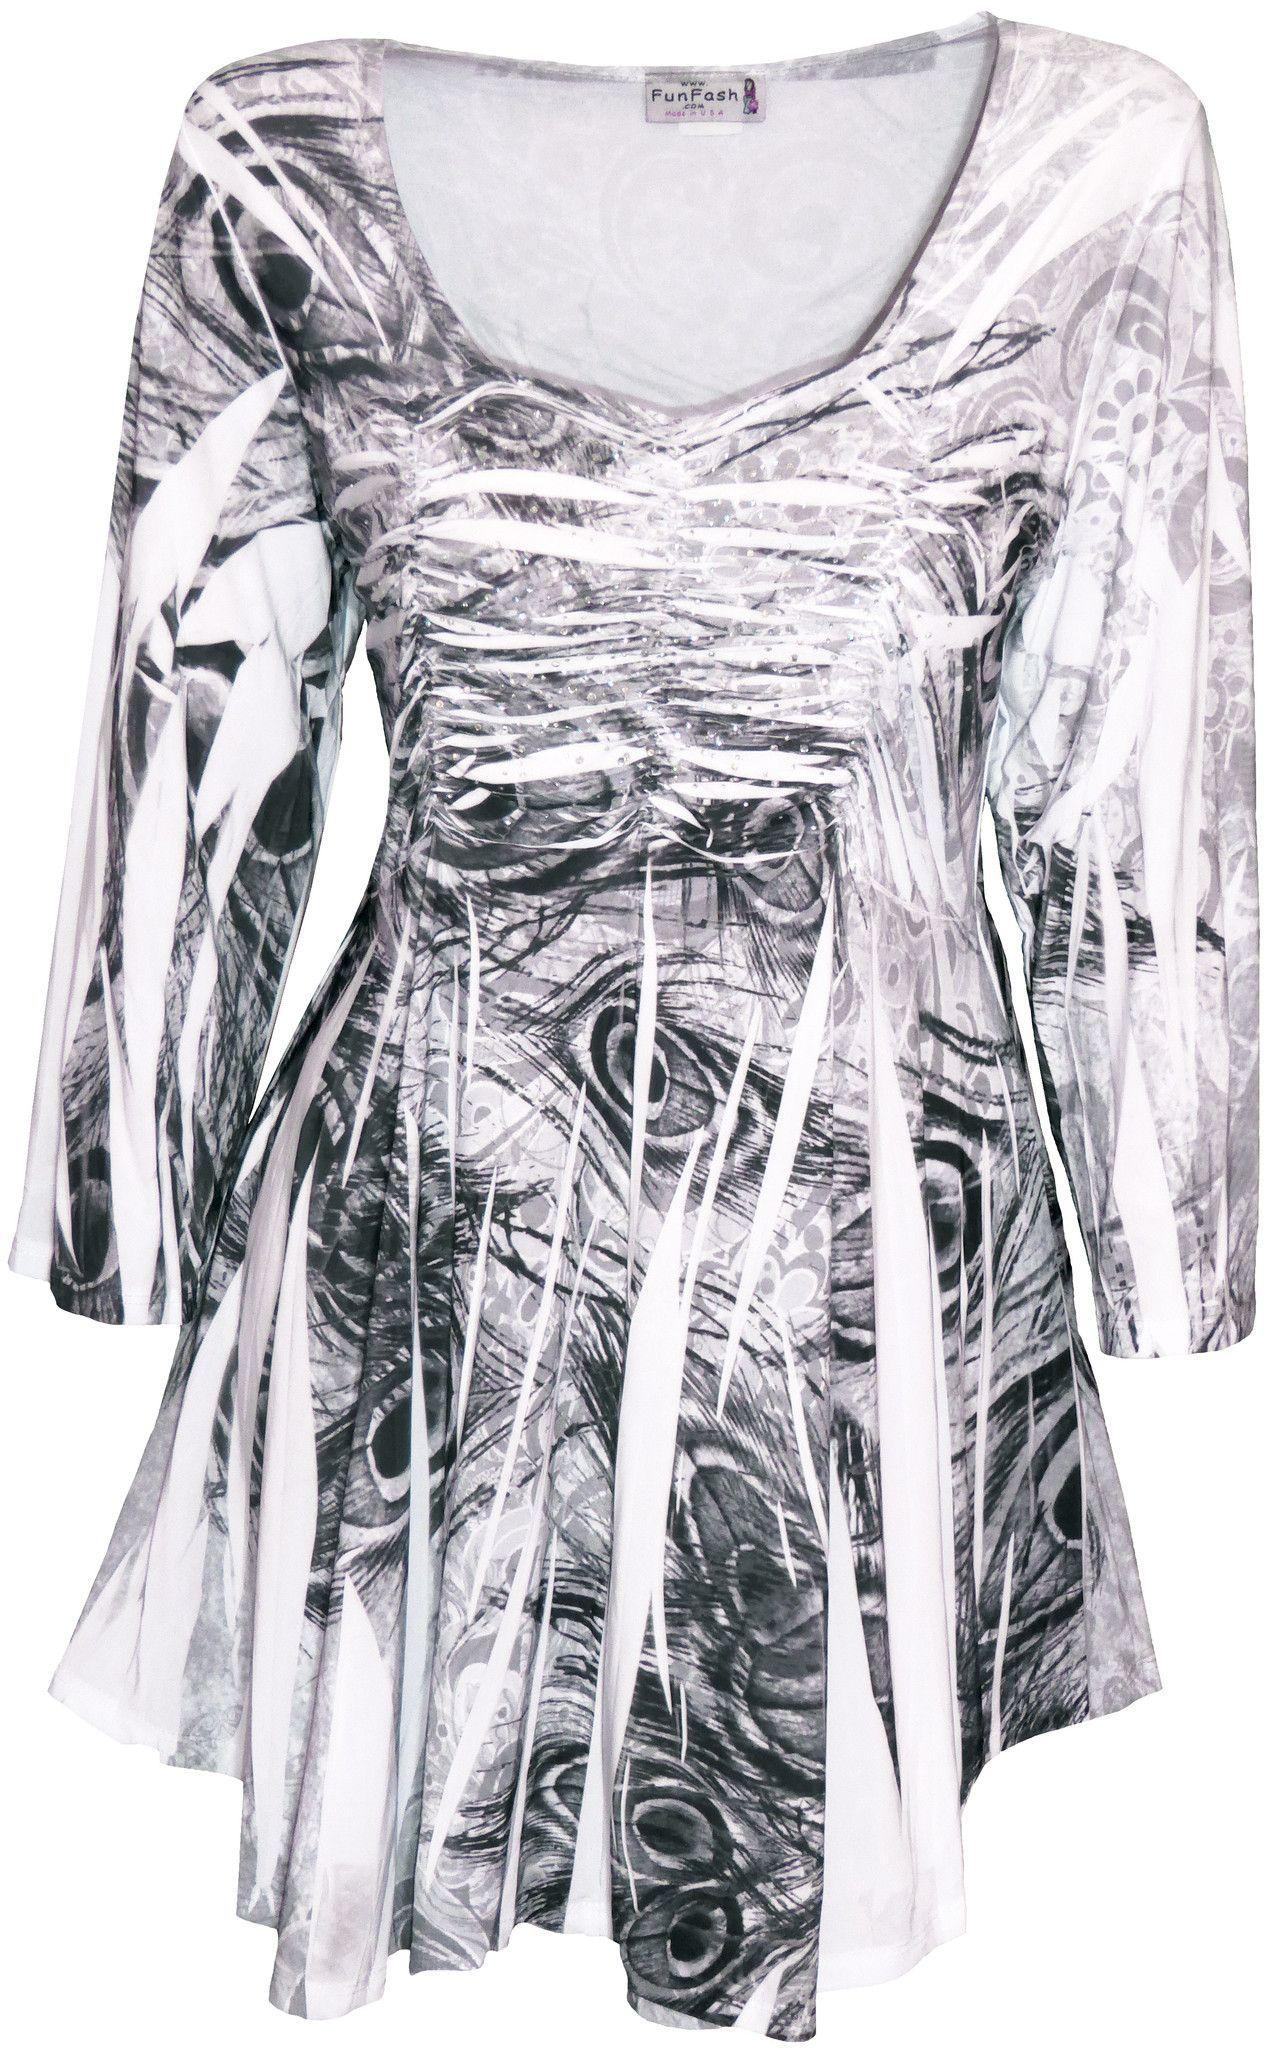 dc0c3b9c283d0 Funfash Plus Size Top Rhinestones Empire Waist Peacock New Women s Shirt  Blouse